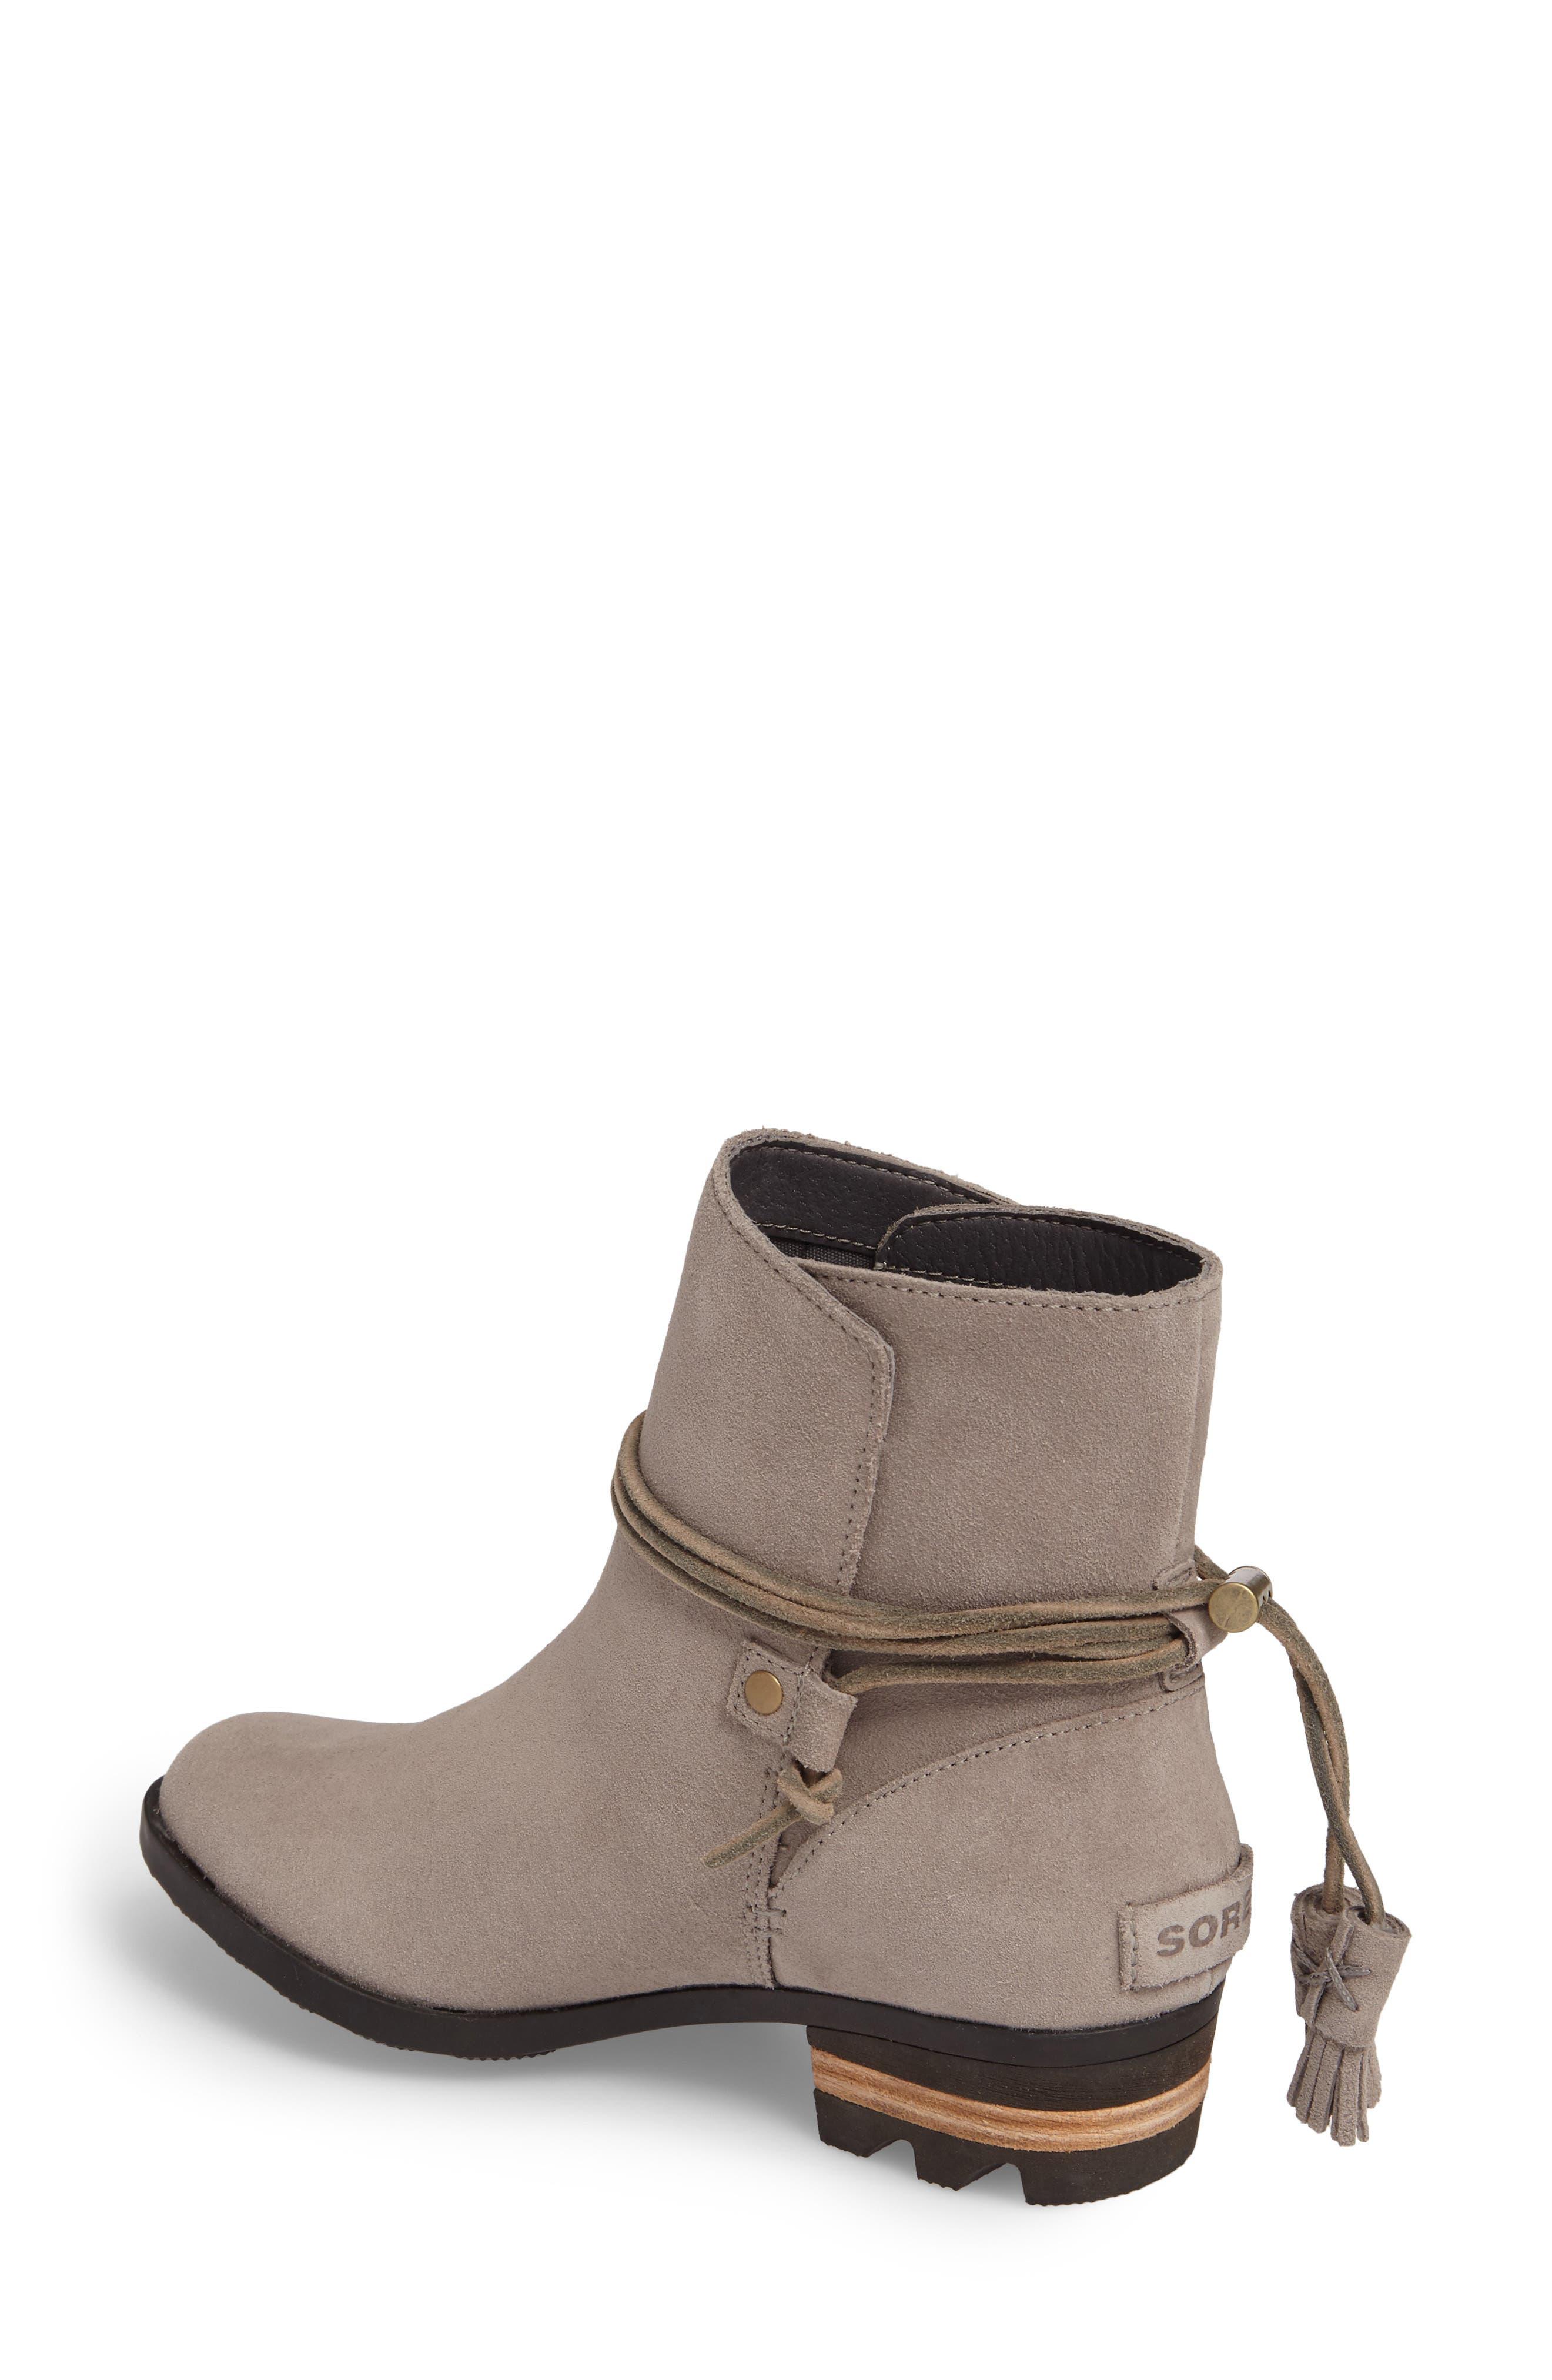 Farah Waterproof Boot,                             Alternate thumbnail 2, color,                             Kettle/ Jet